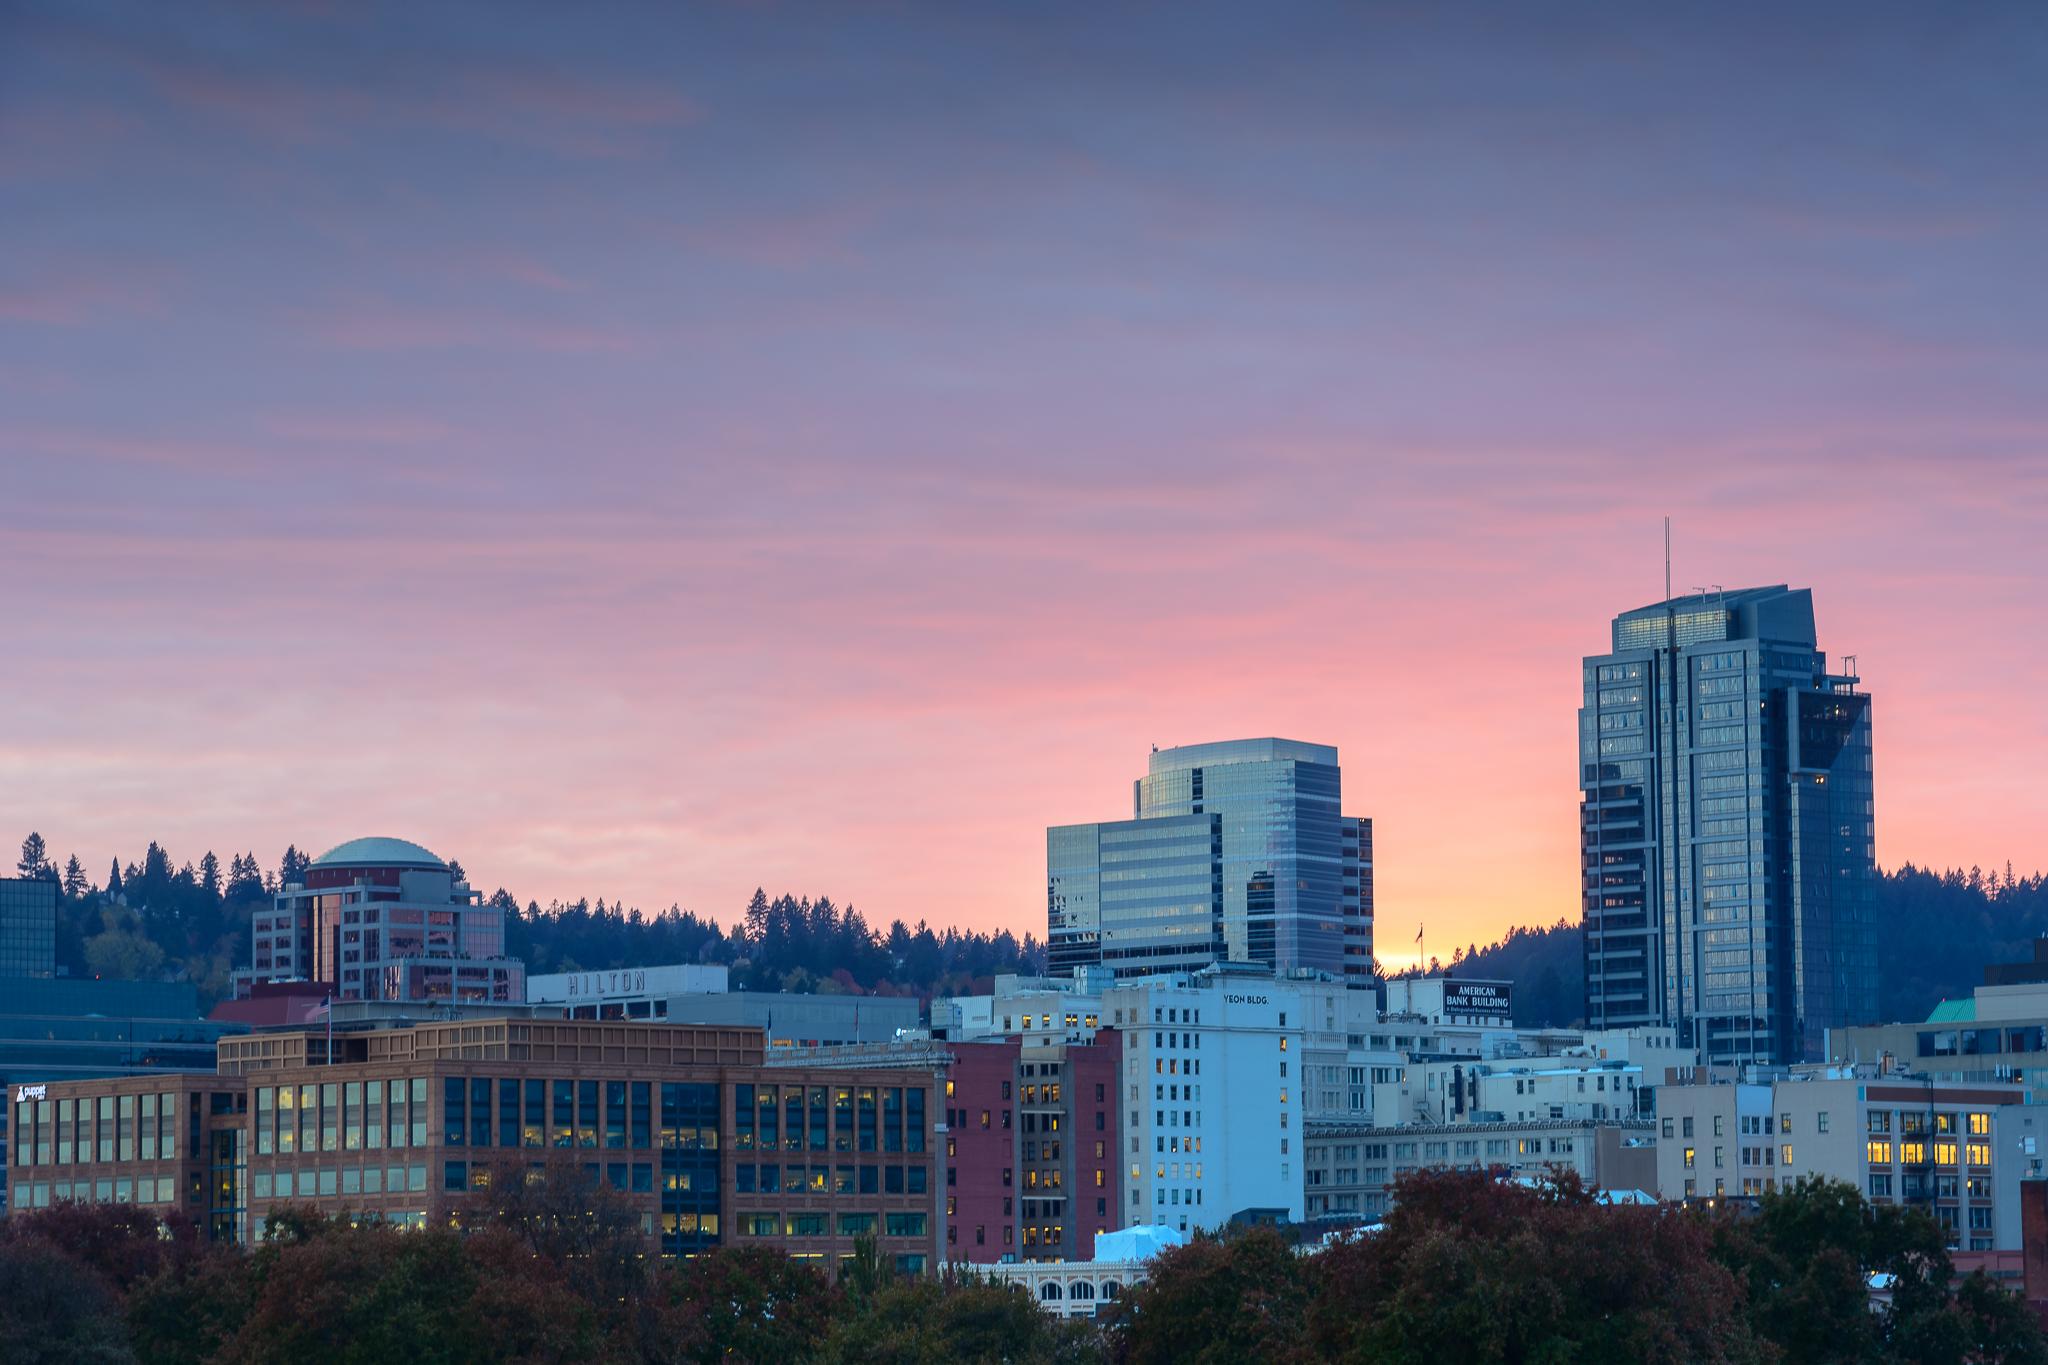 Goodnight from the Burnside Bridge. Central Portland.